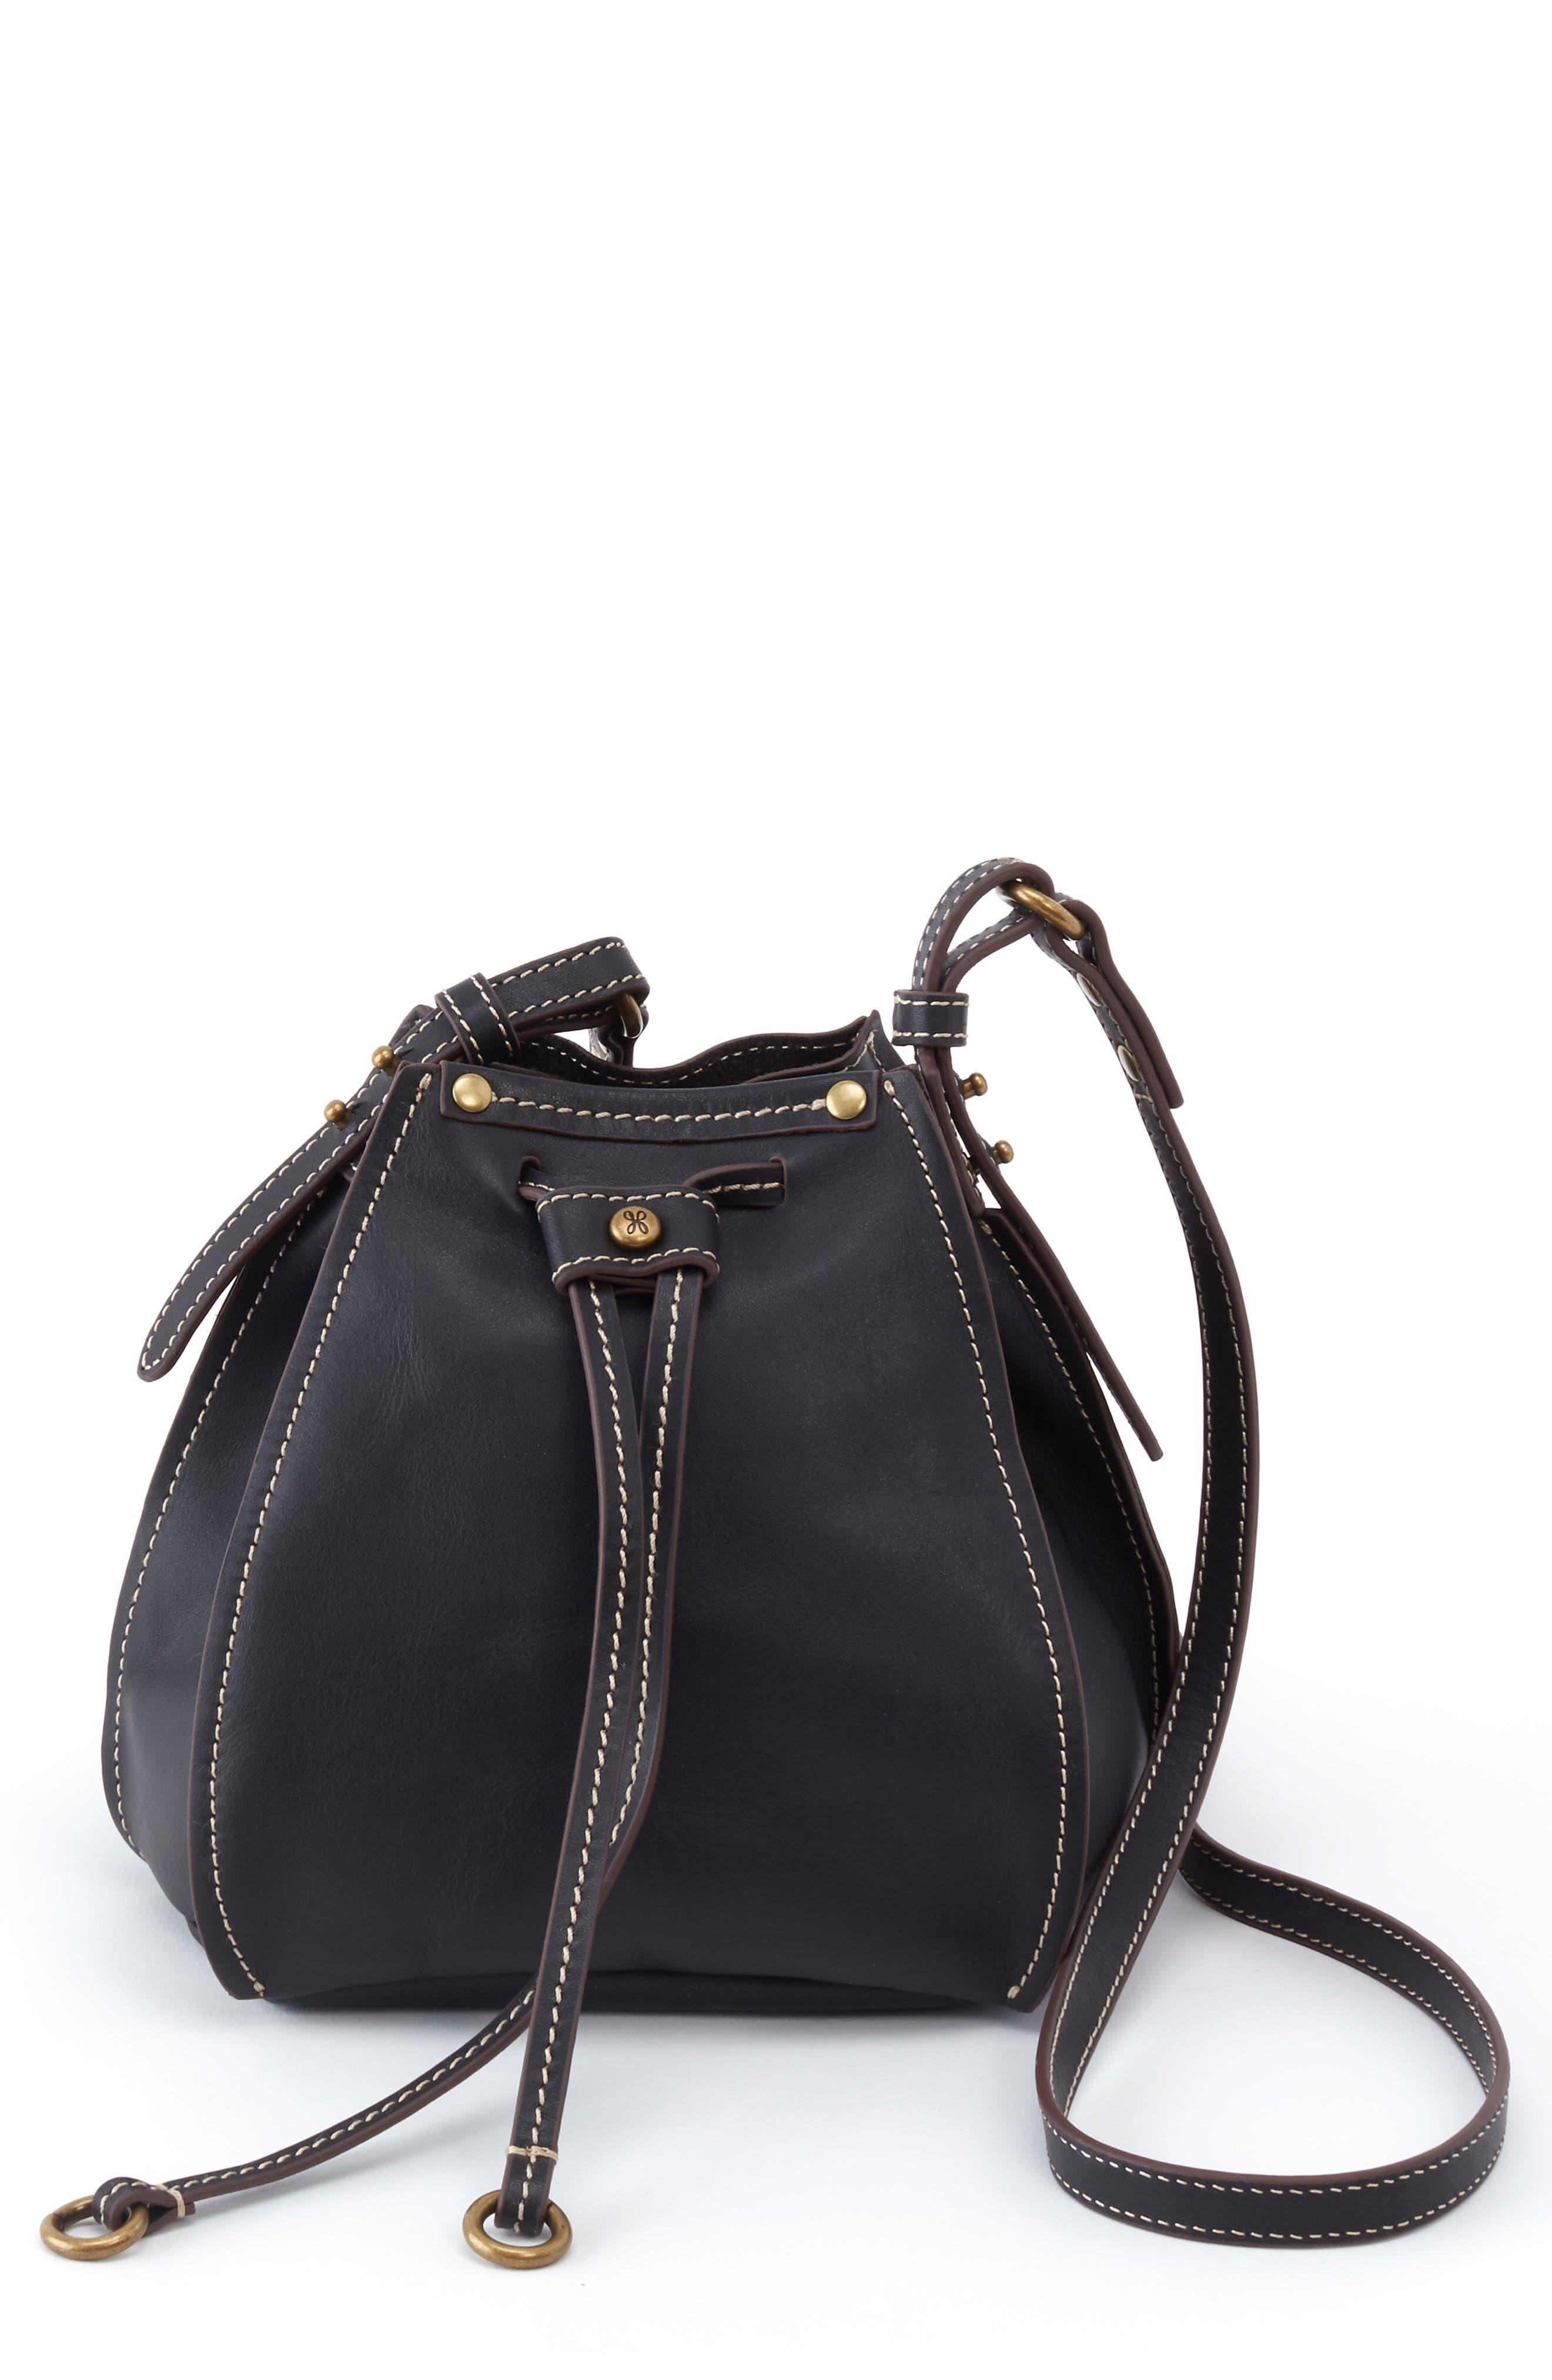 Image of Hobo Cinder Leather Crossbody Bag